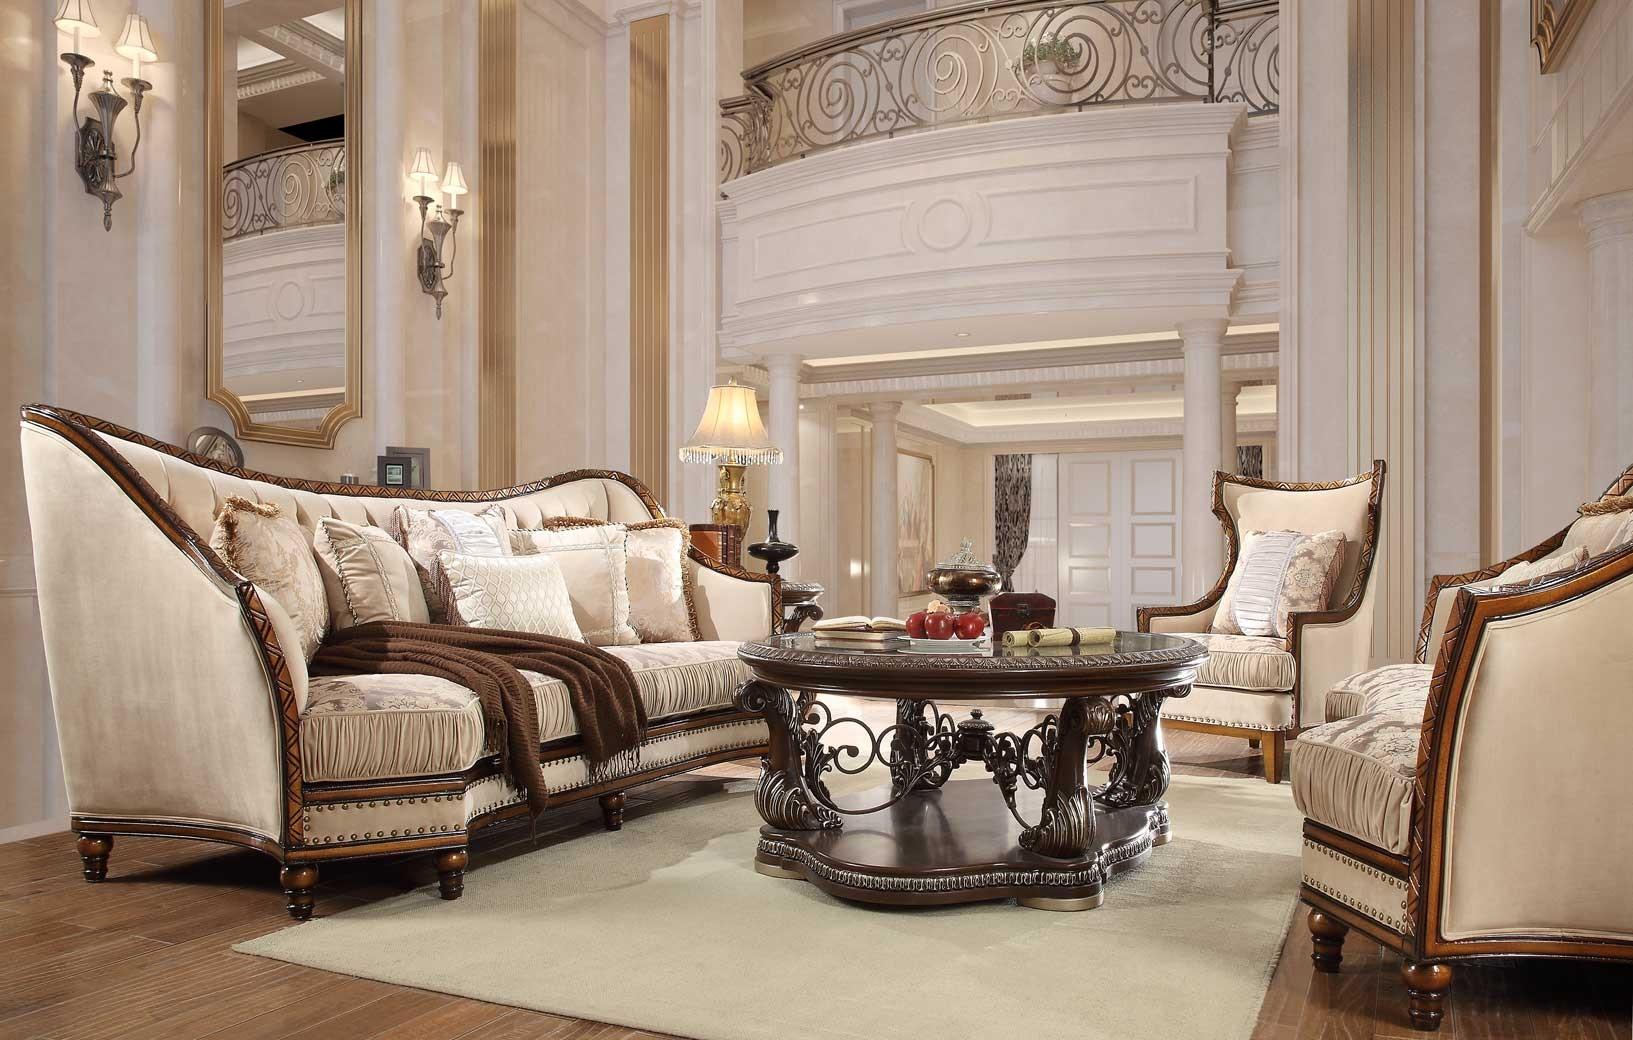 hd 823 homey design upholstery living room set victorian - Homey Design Upholstered